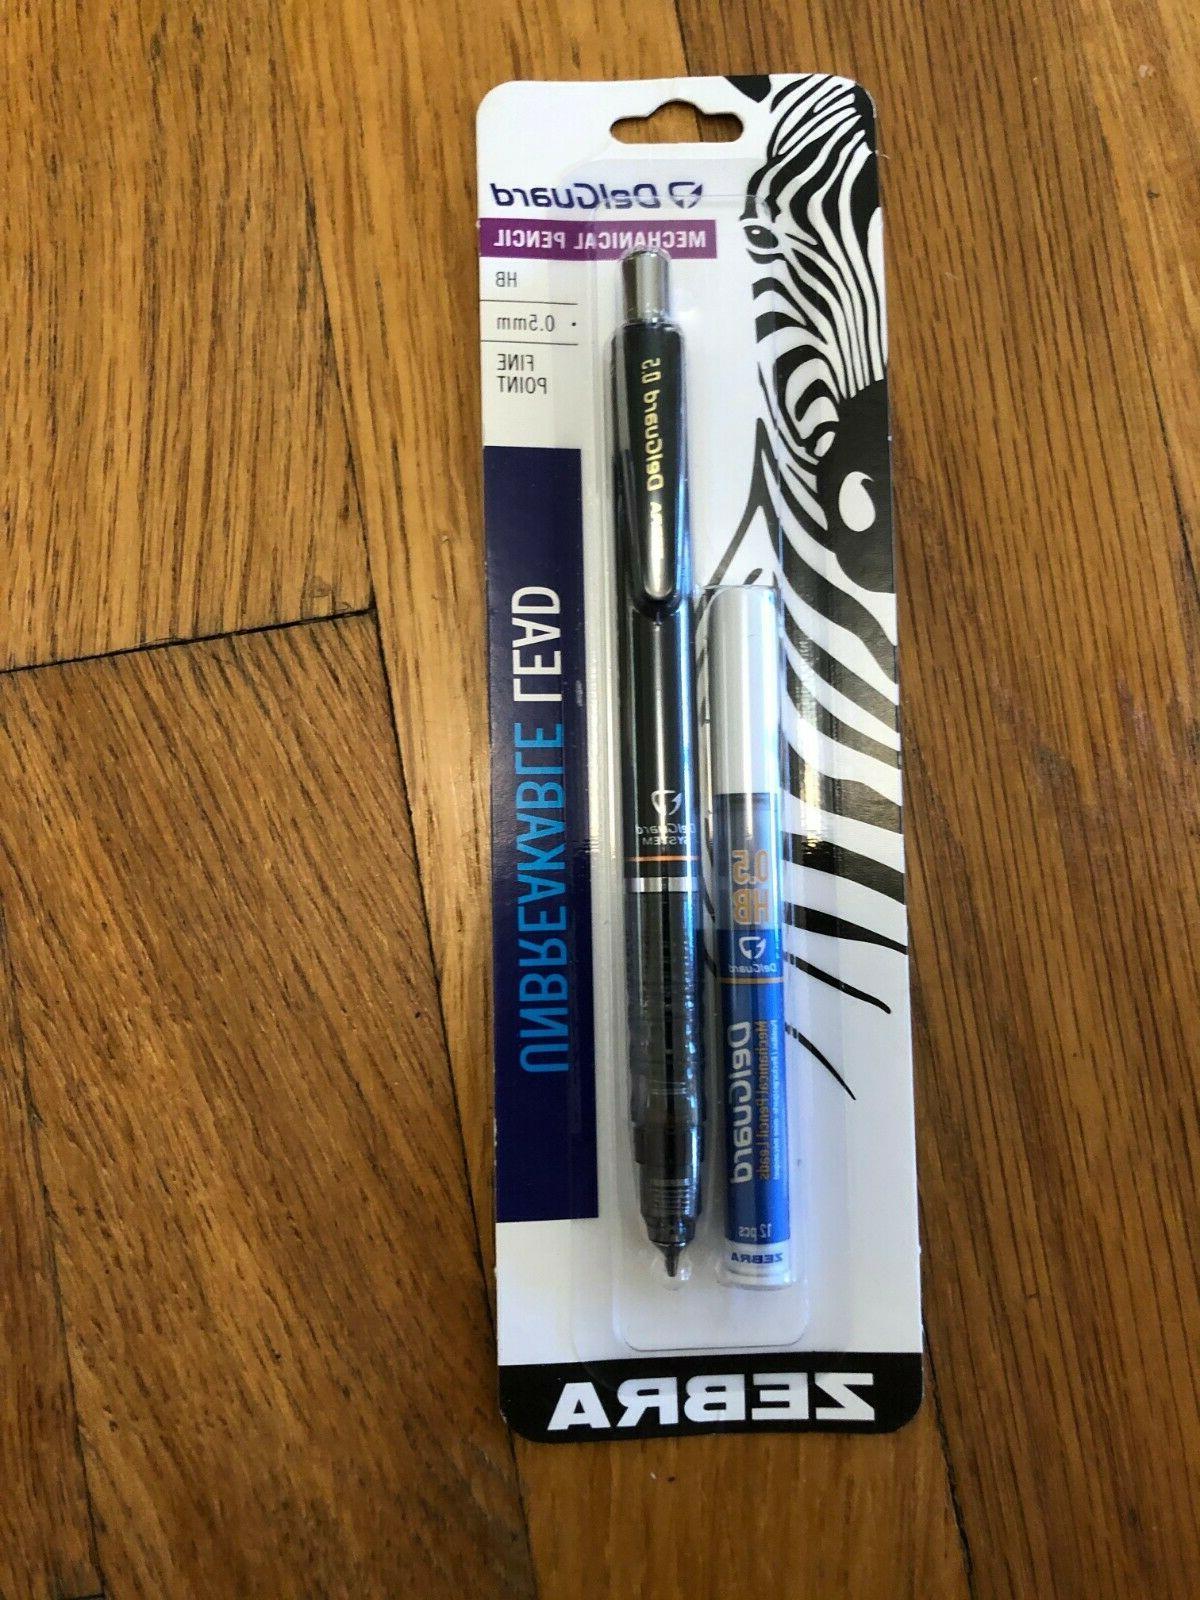 Mechanical Pencil, 0.5 mm, Unbreakable Lead, Black